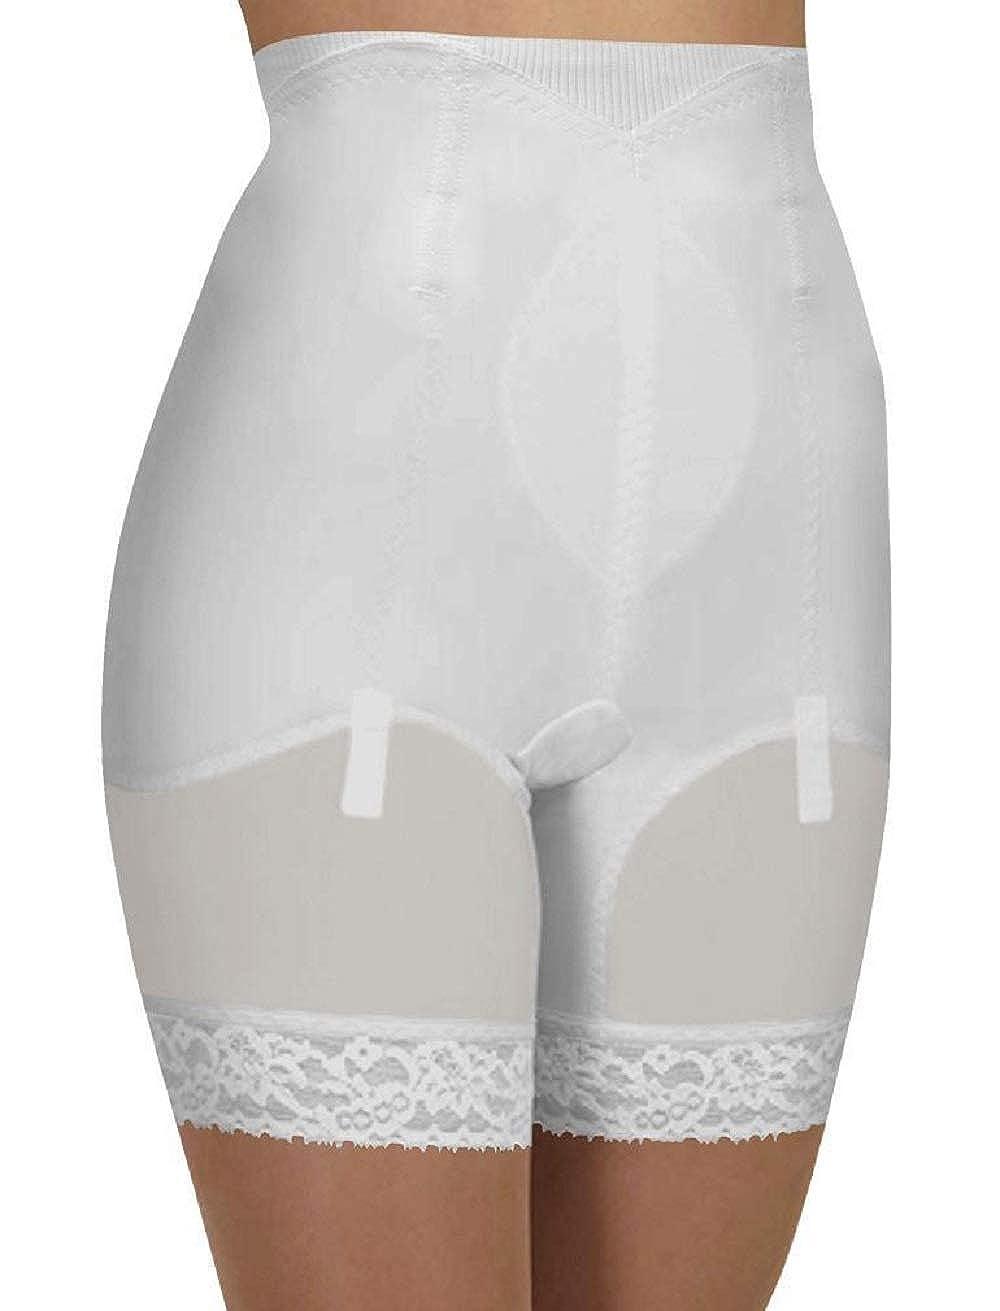 486550343 Cortland Venus Band Top Panty Girdle at Amazon Women s Clothing store